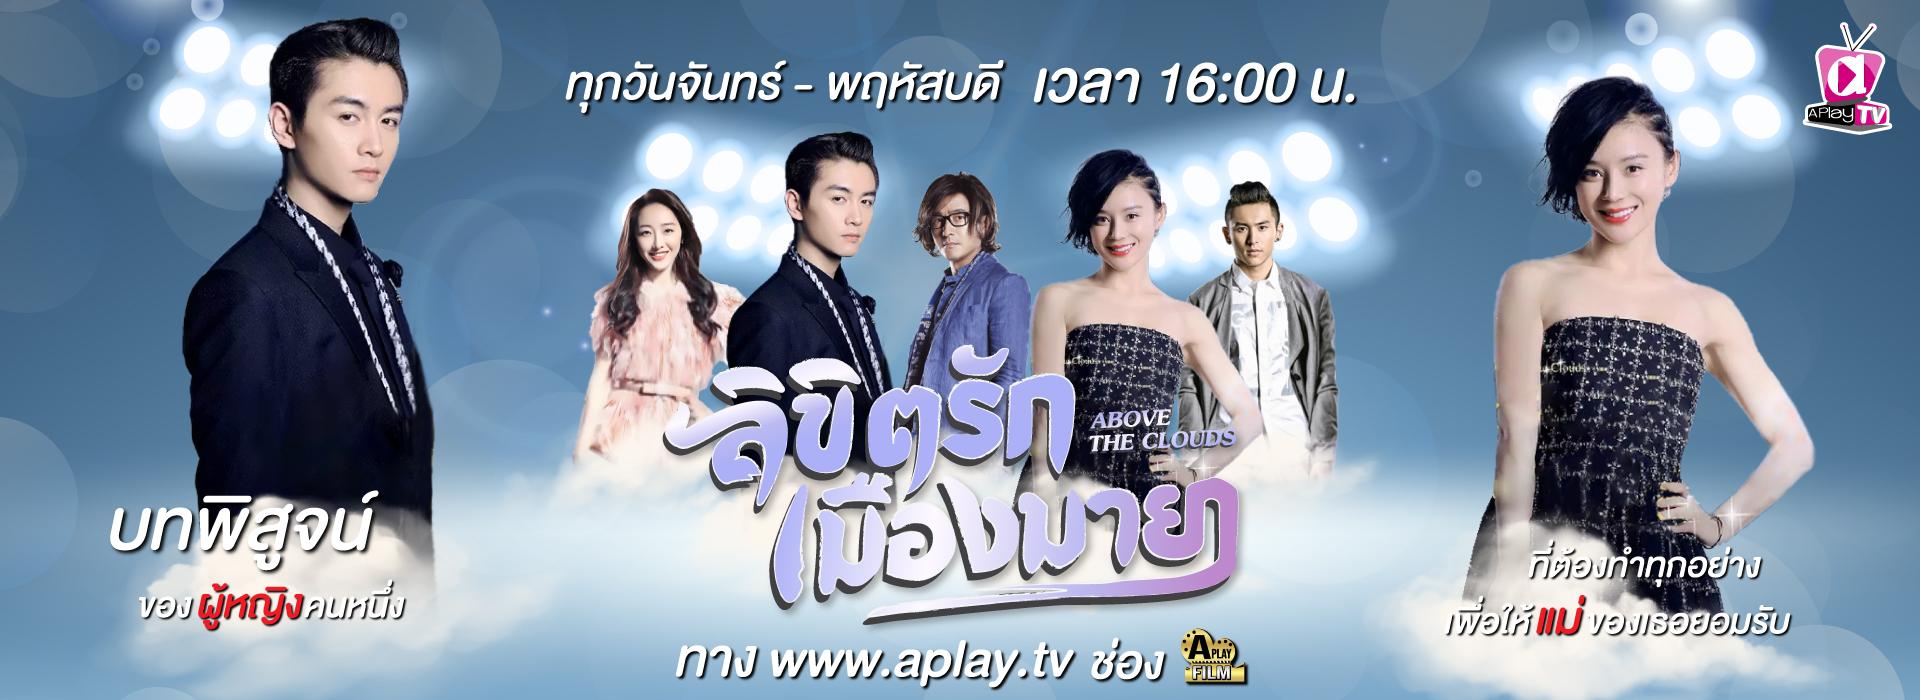 banner broadcast TV Show